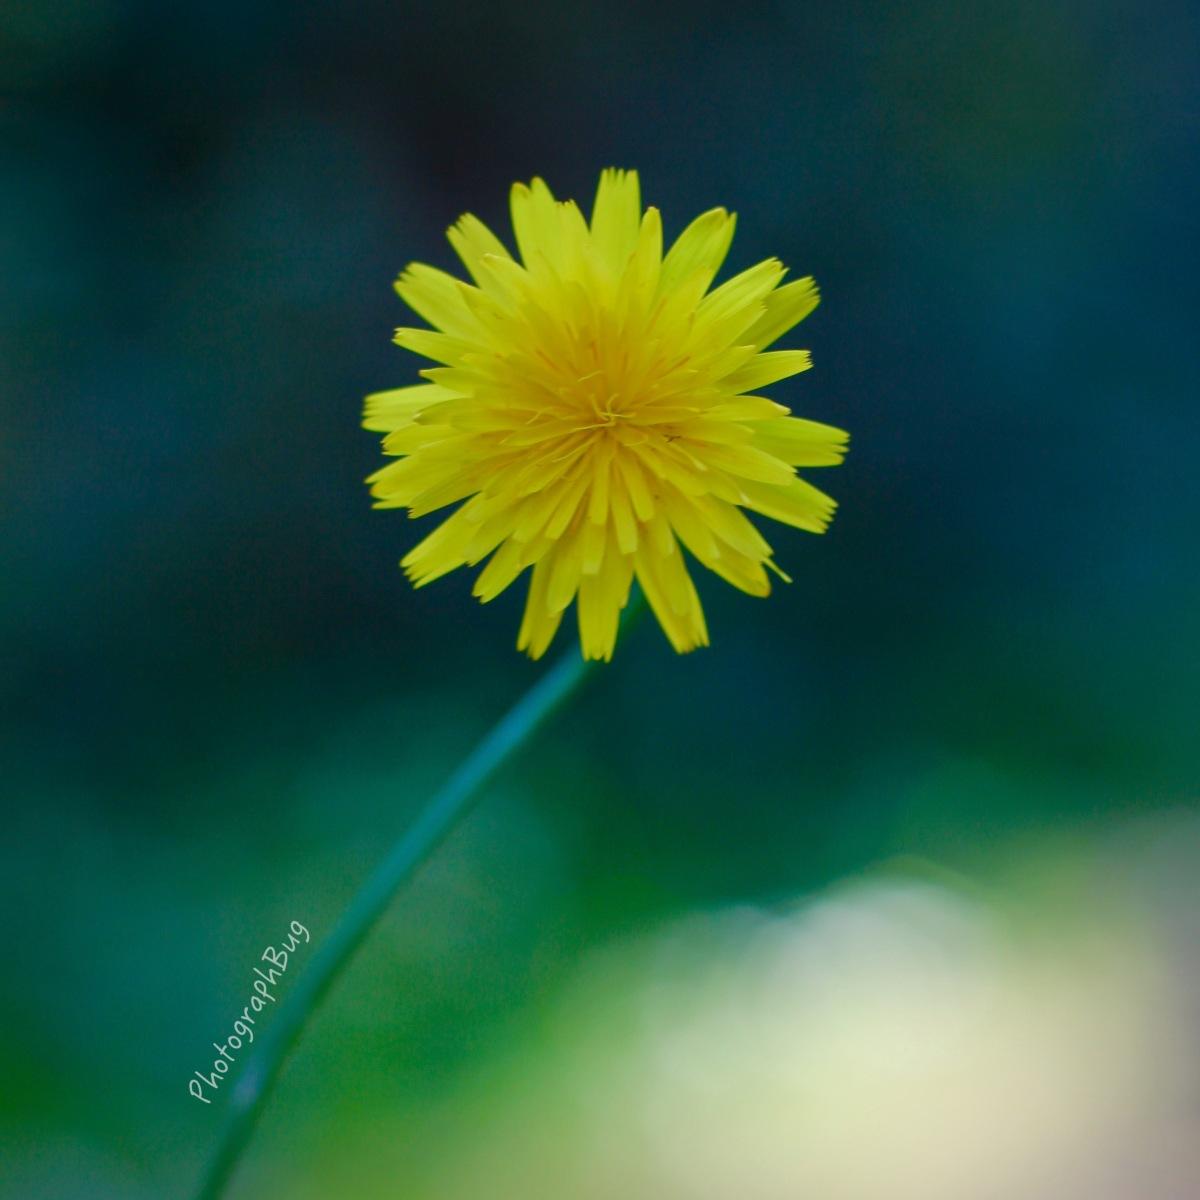 Yellow Flower Nature Plant Leaves Leaf Macro .jpg